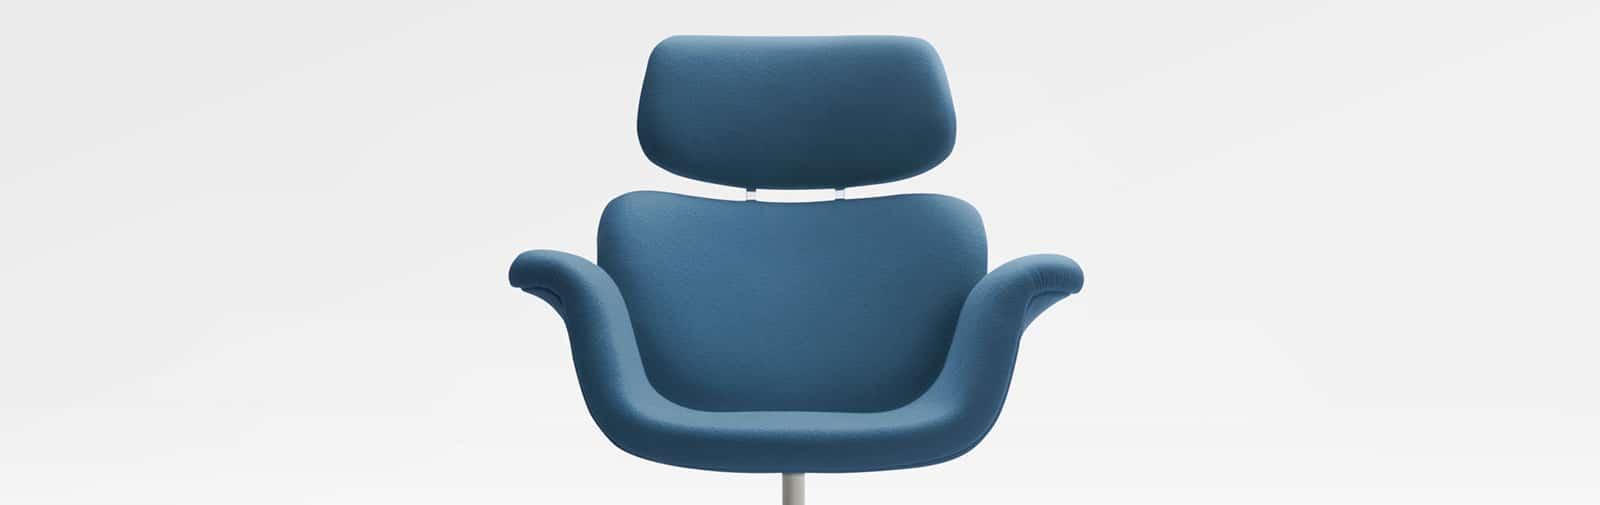 Artifort Draai Fauteuil.Design Fauteuil Tulip Artifort Meubilair Interieurhof Alkmaar